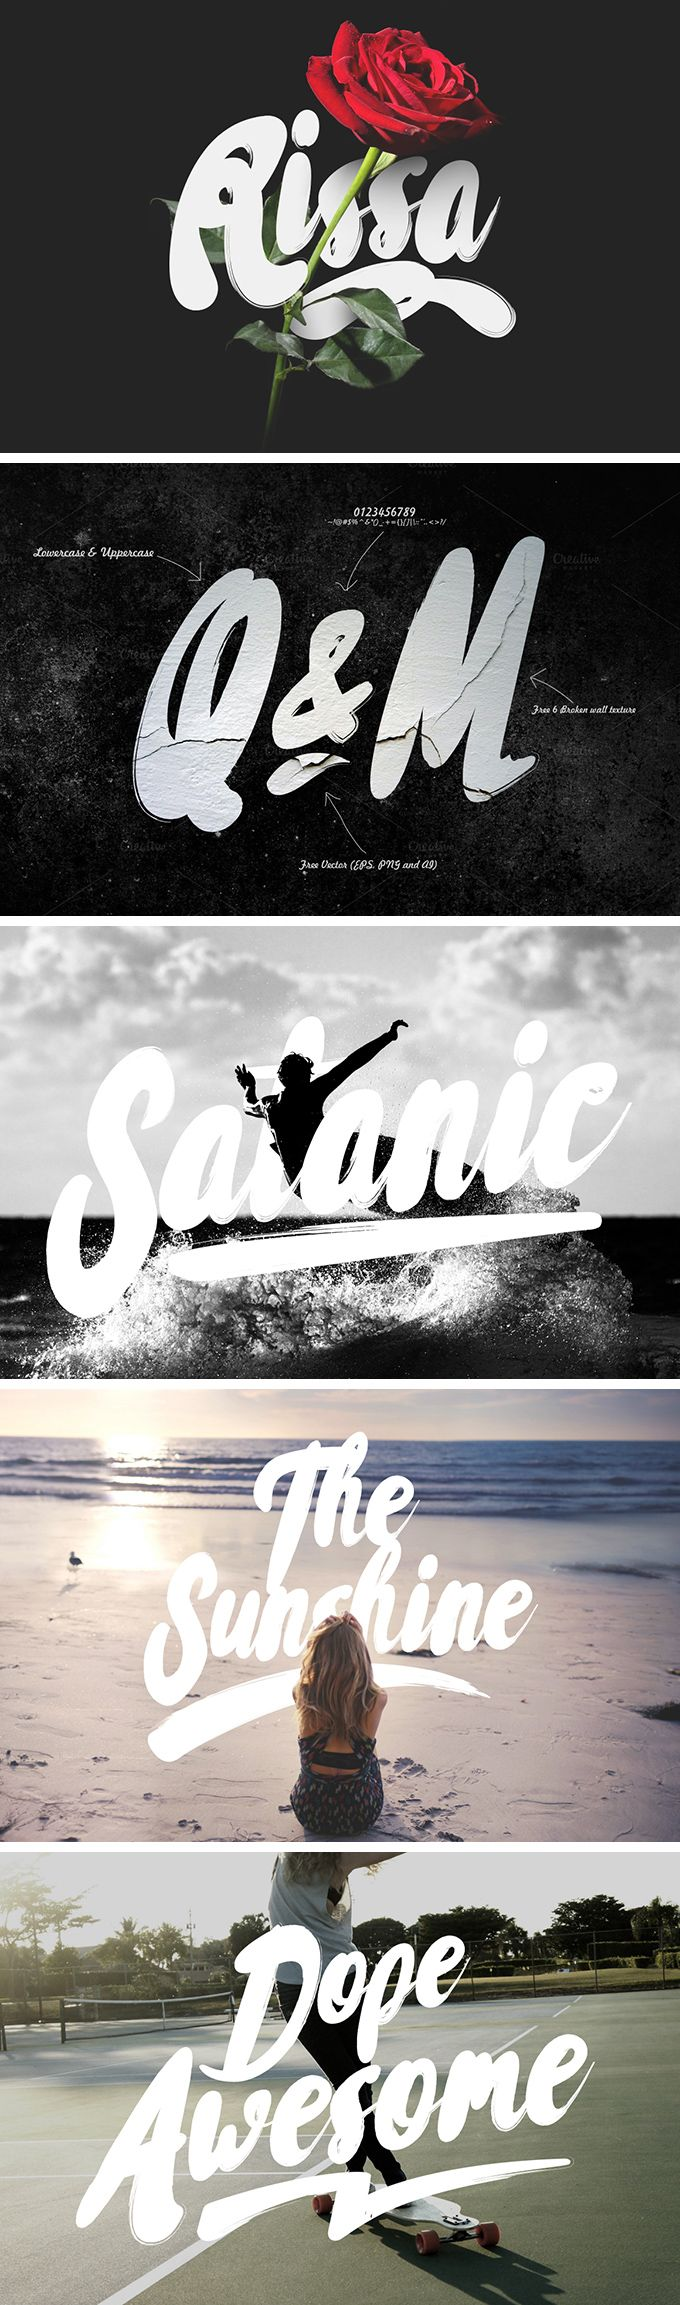 Rissa Typeface Download: https://pixelbuddha.net/freebie/free-font-rissa-typeface-download